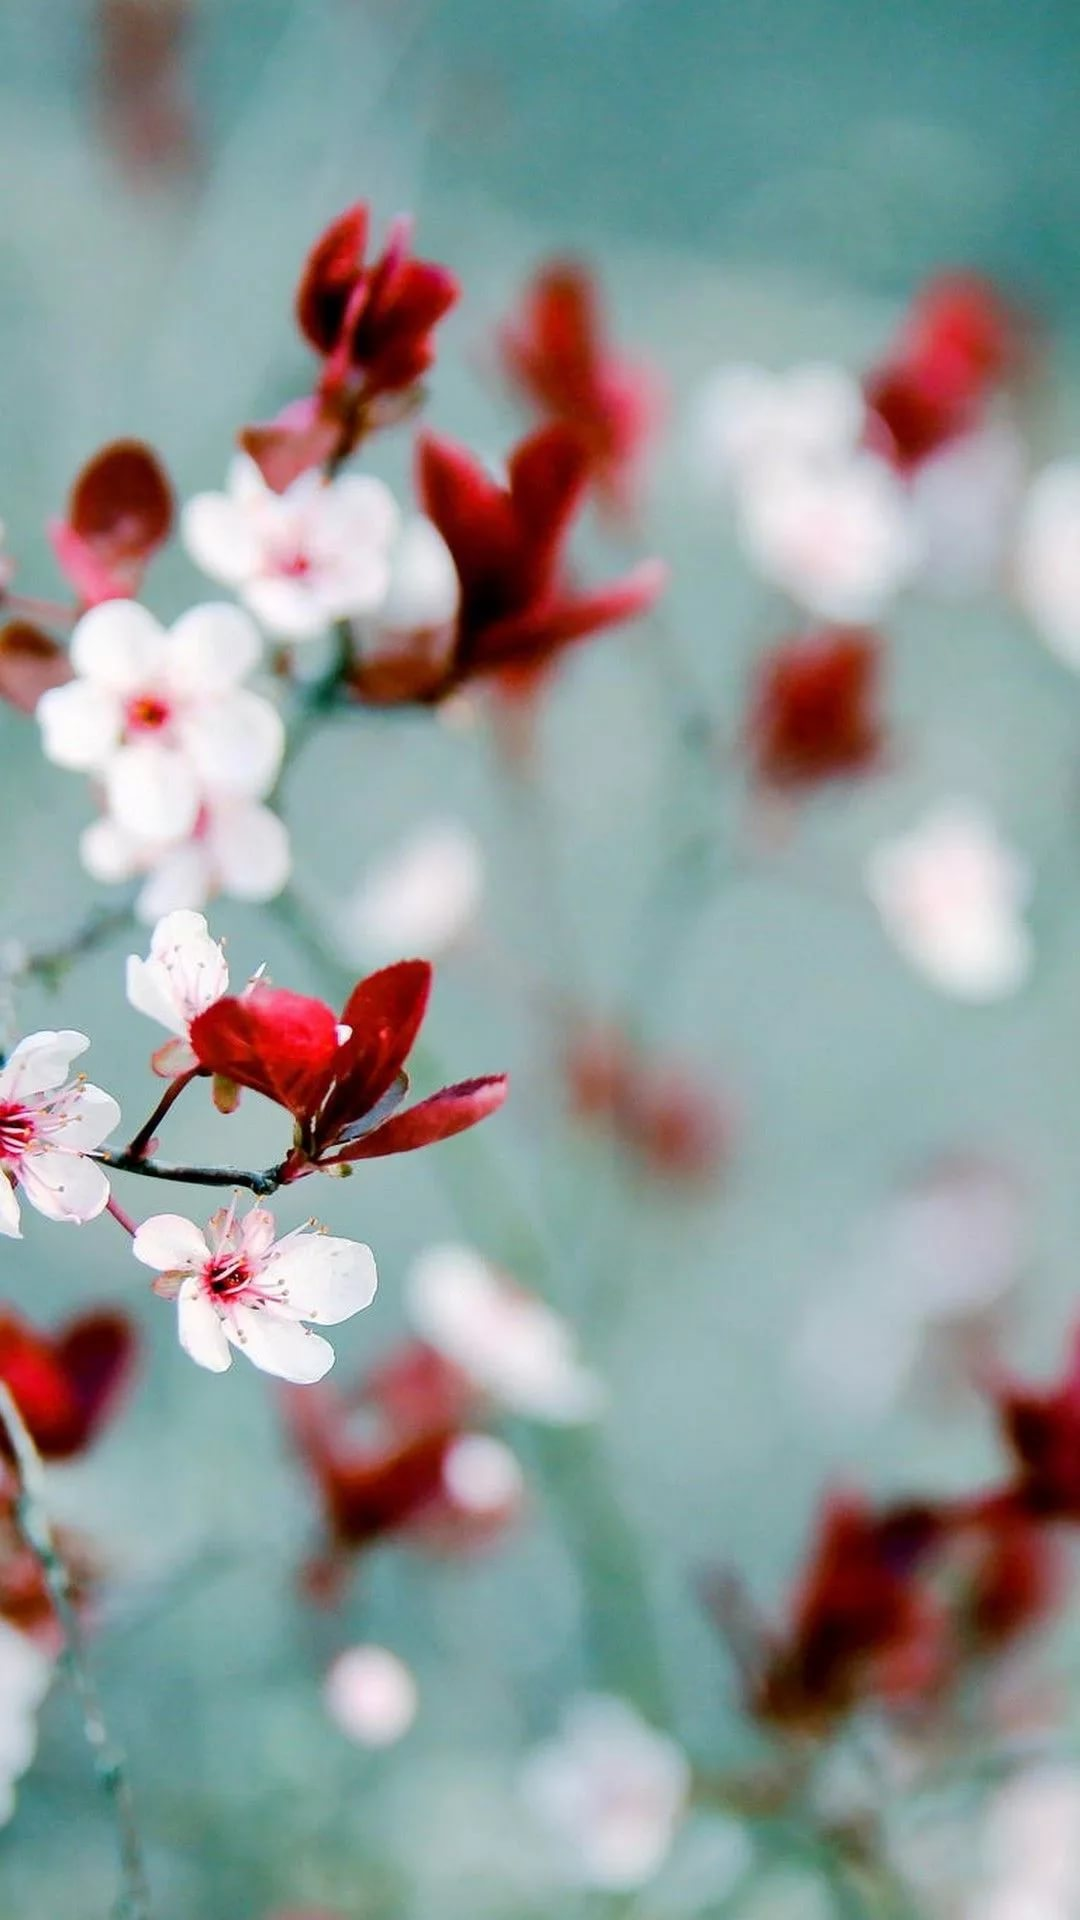 Красивые hd обои весна на телефон 13